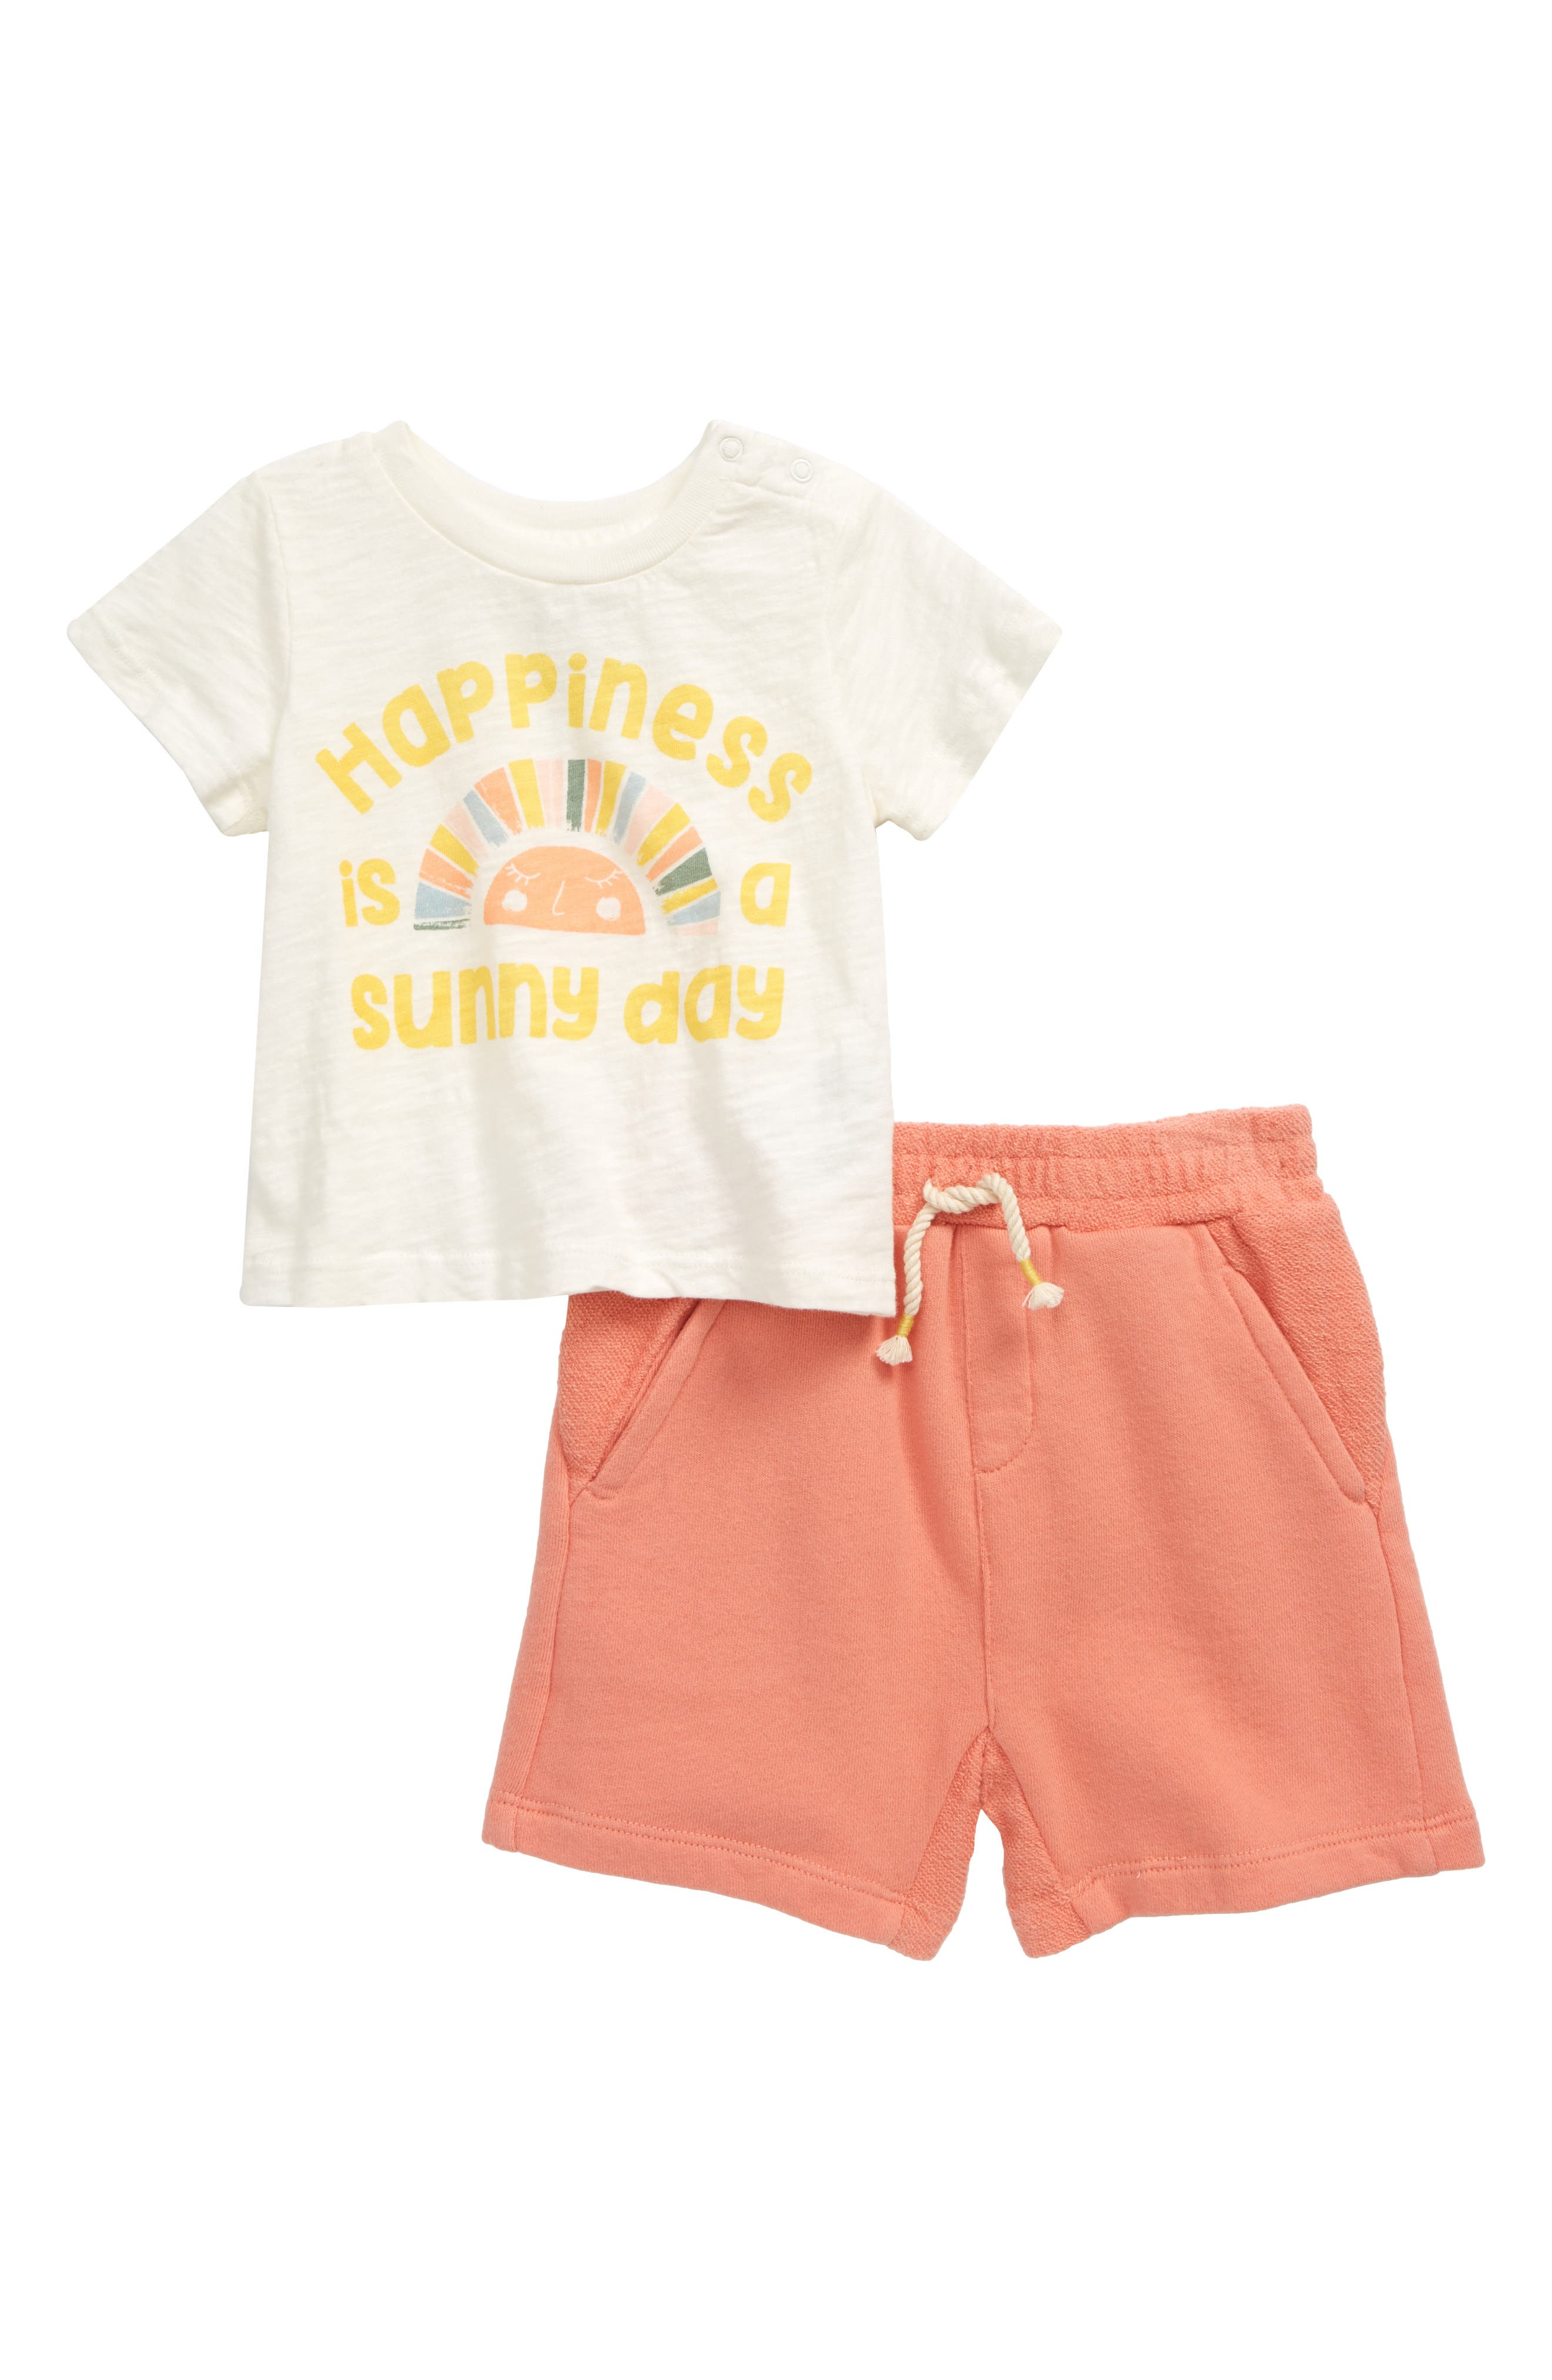 Autism Awareness Unisex Baby Sweatpants Classic Baby Boy Jogger Play Pant